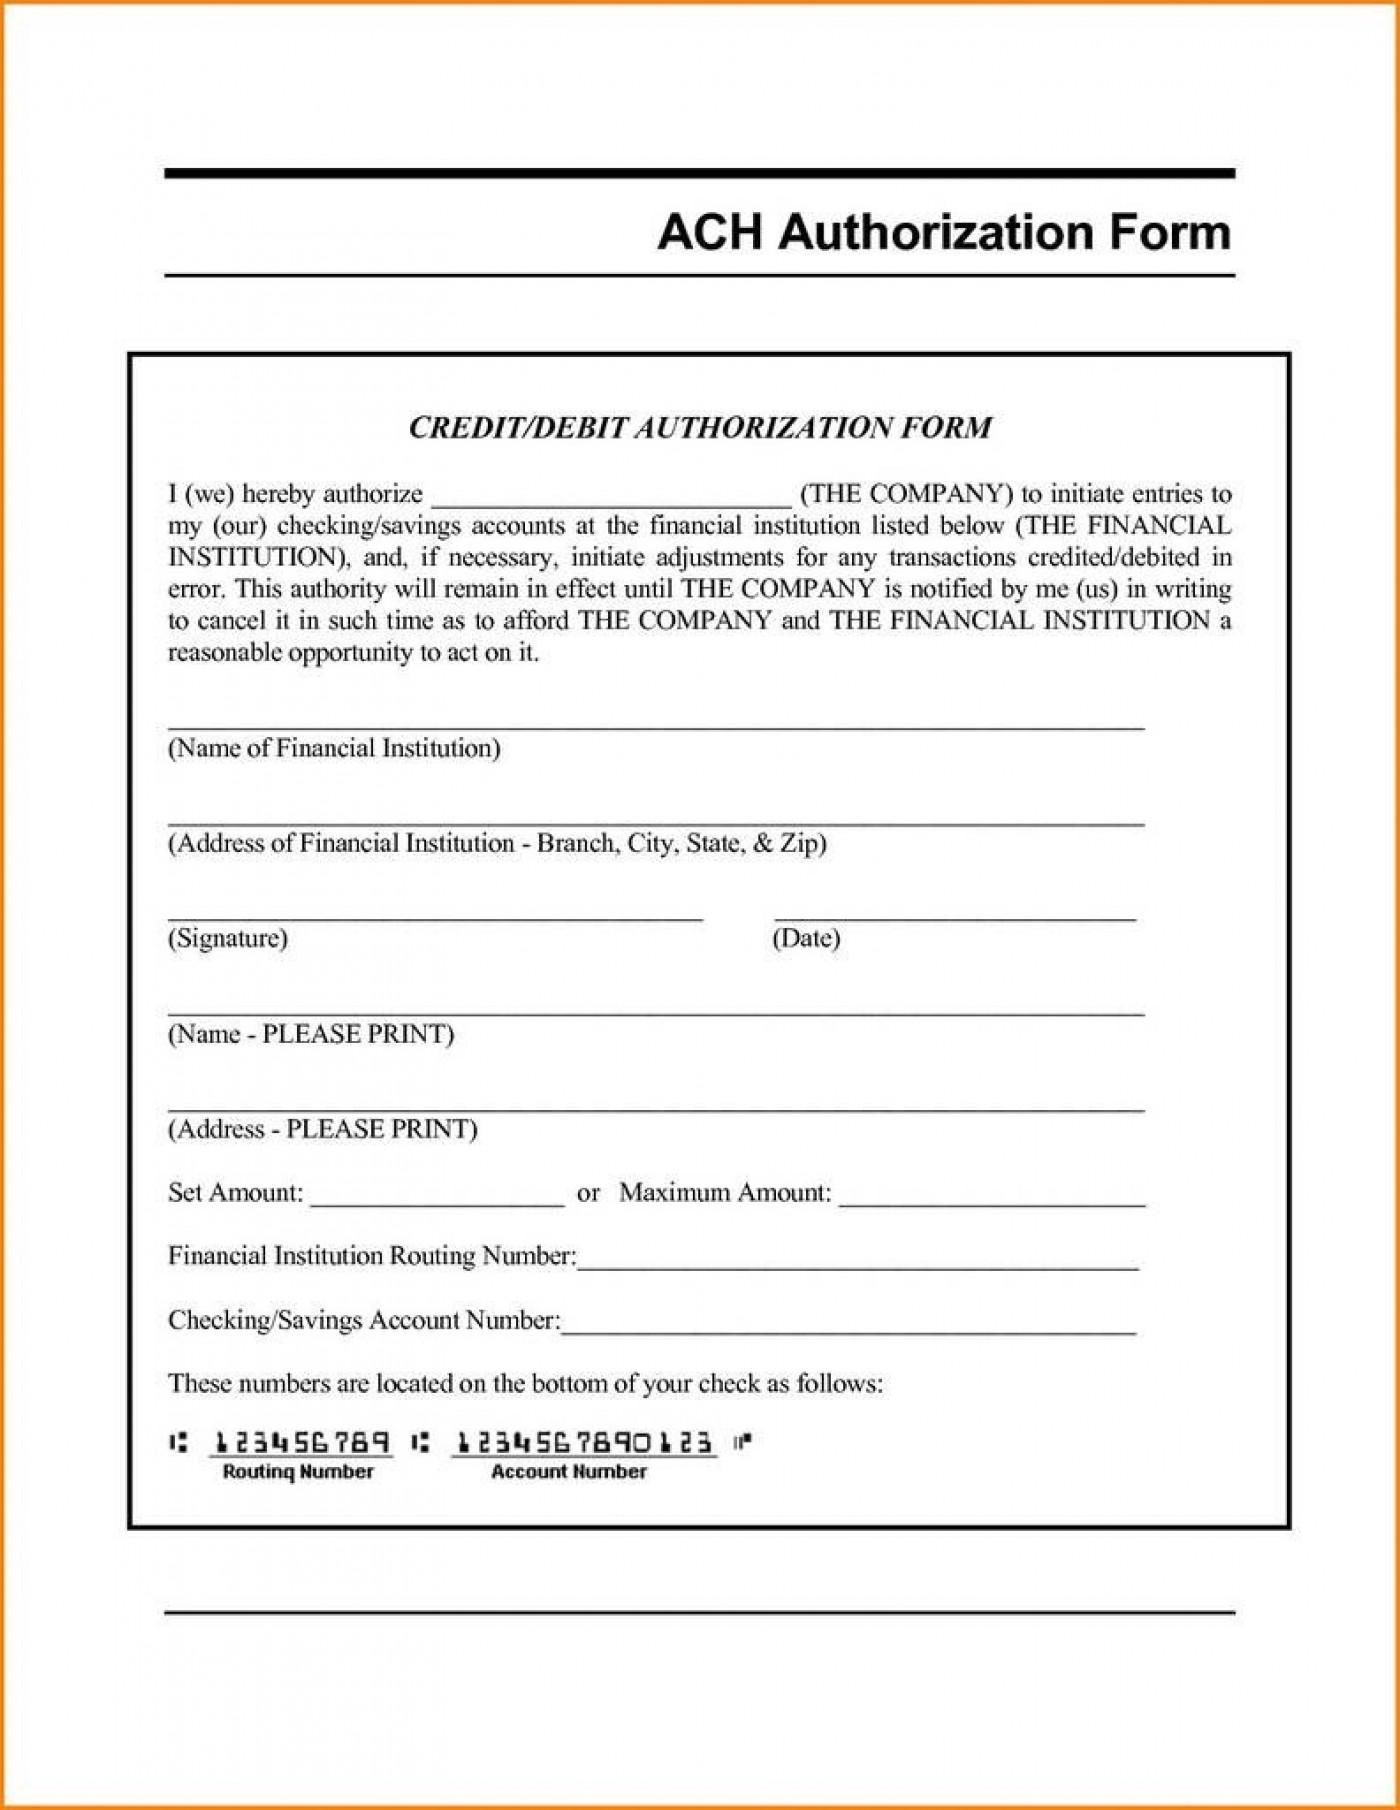 009 Impressive Credit Card Form Template Html Idea  Example Payment Cs1400